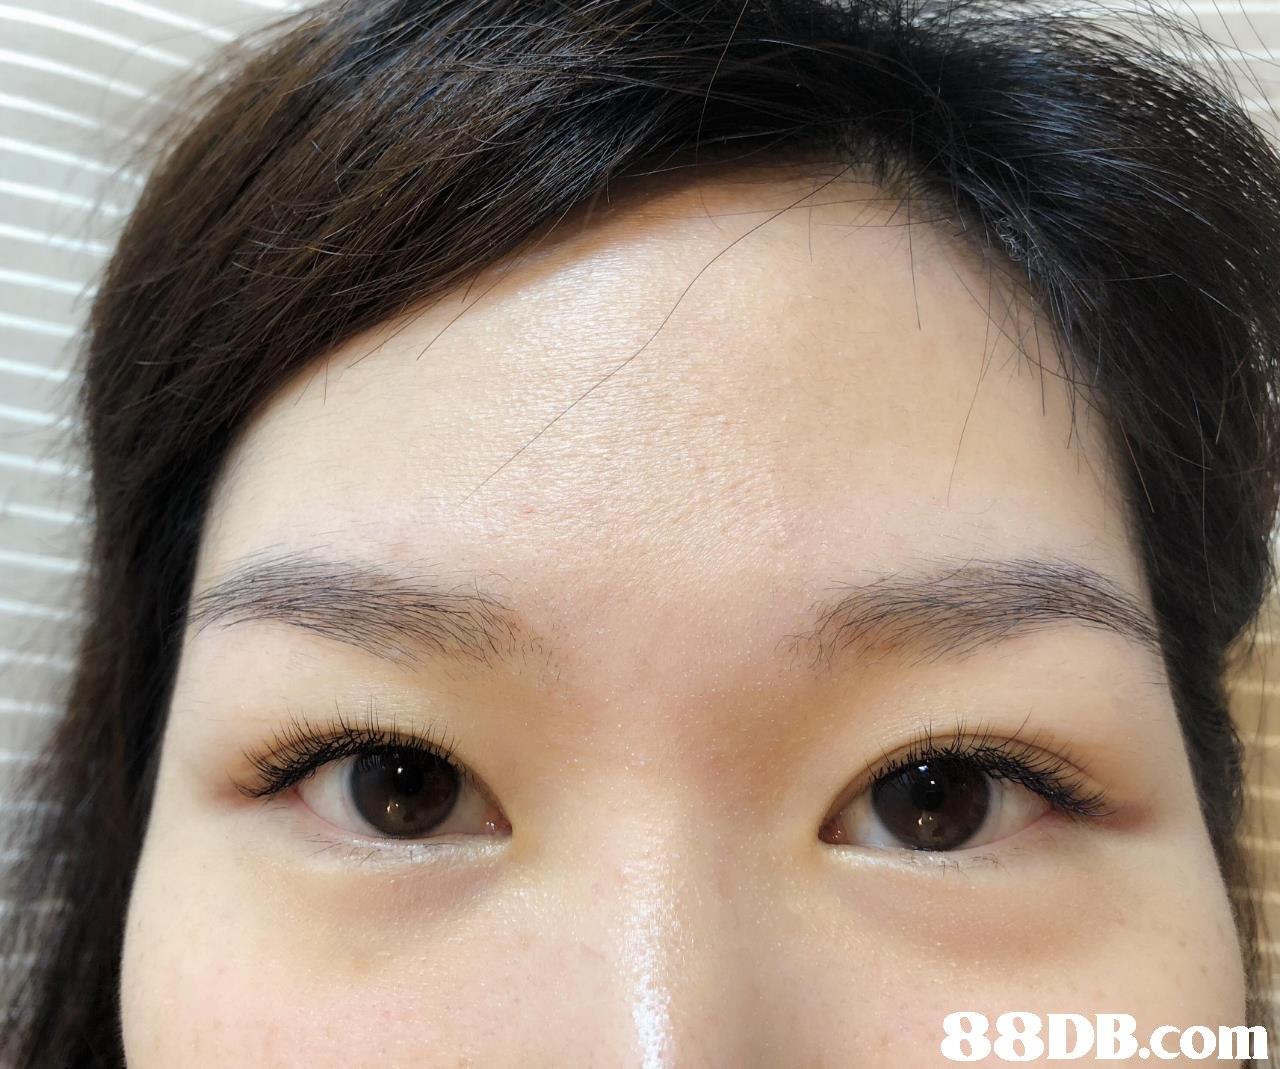 Eyebrow,Face,Forehead,Hair,Nose